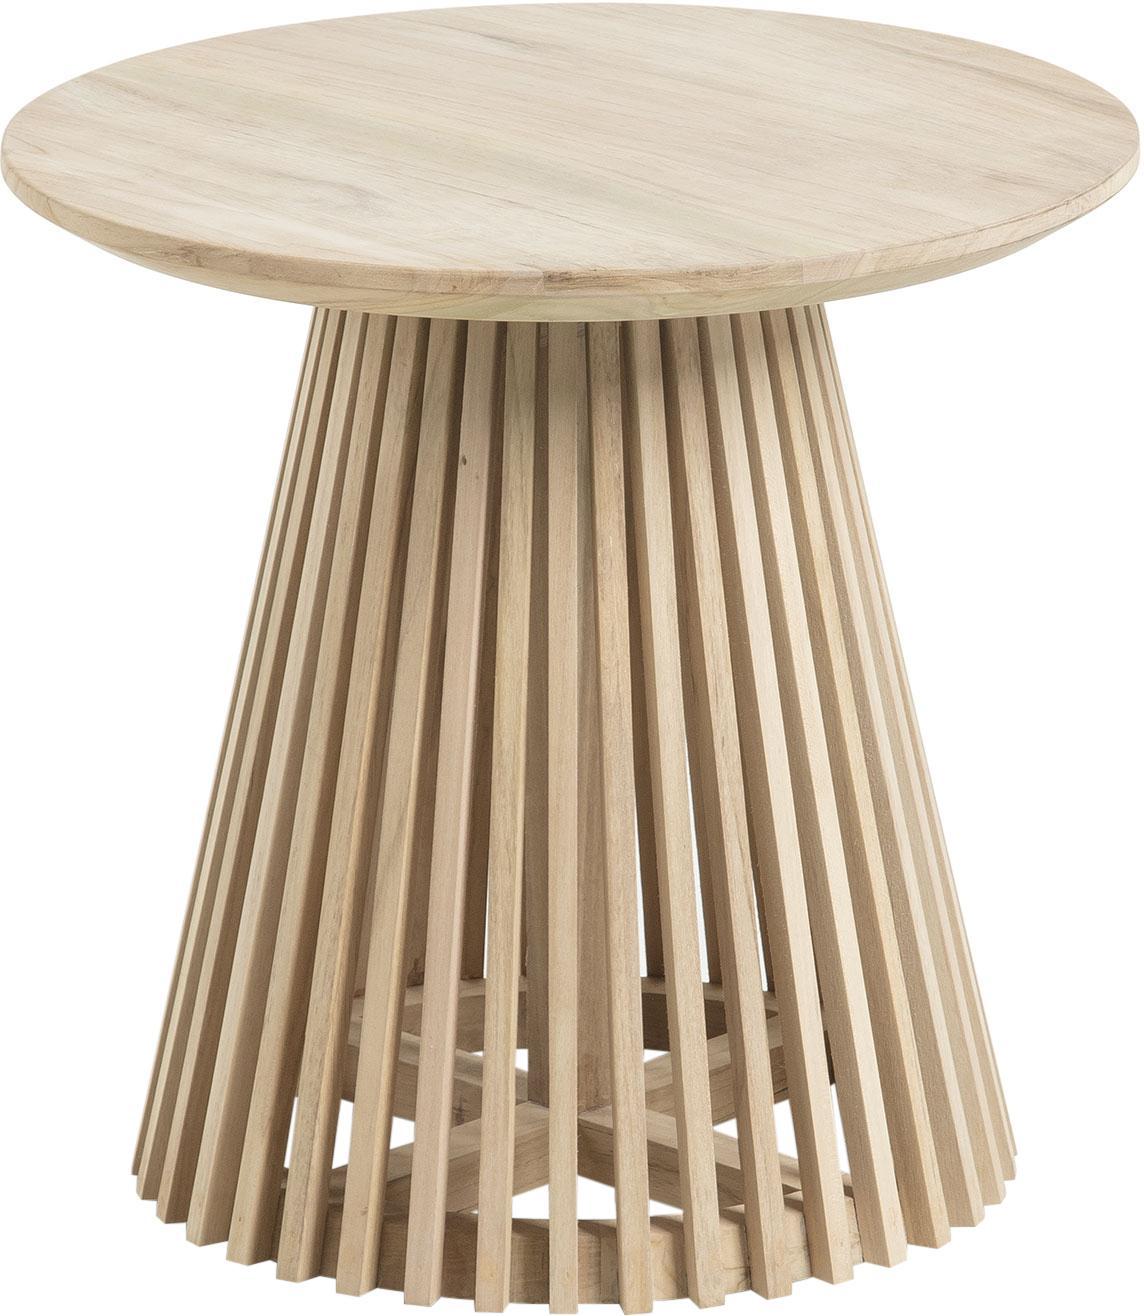 Tavolino rotondo in legno Jeanette, Legno di teak, Legno di teak, Ø 50 x Alt. 48 cm